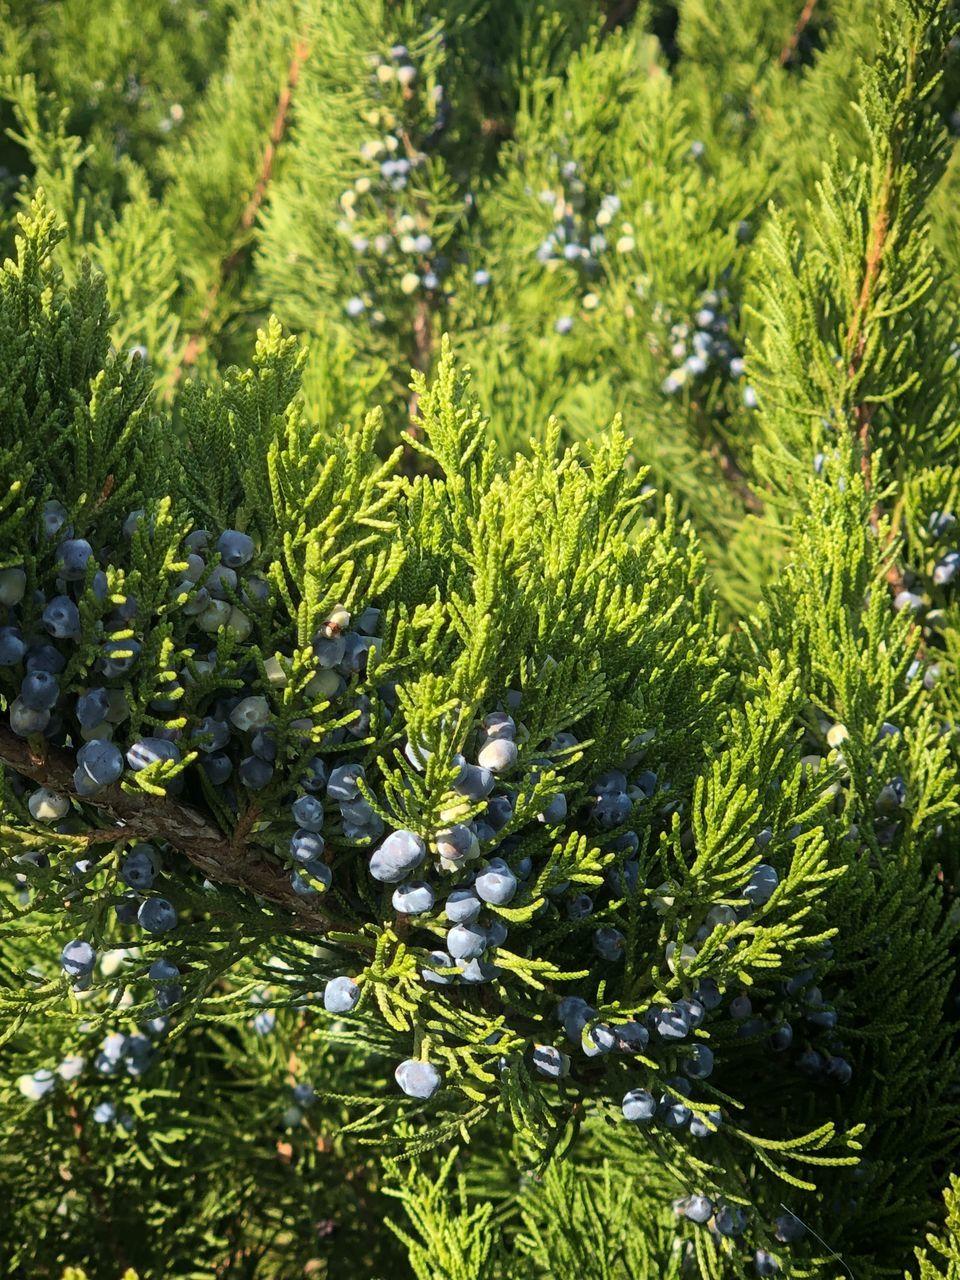 FULL FRAME SHOT OF PLANTS GROWING ON LAND